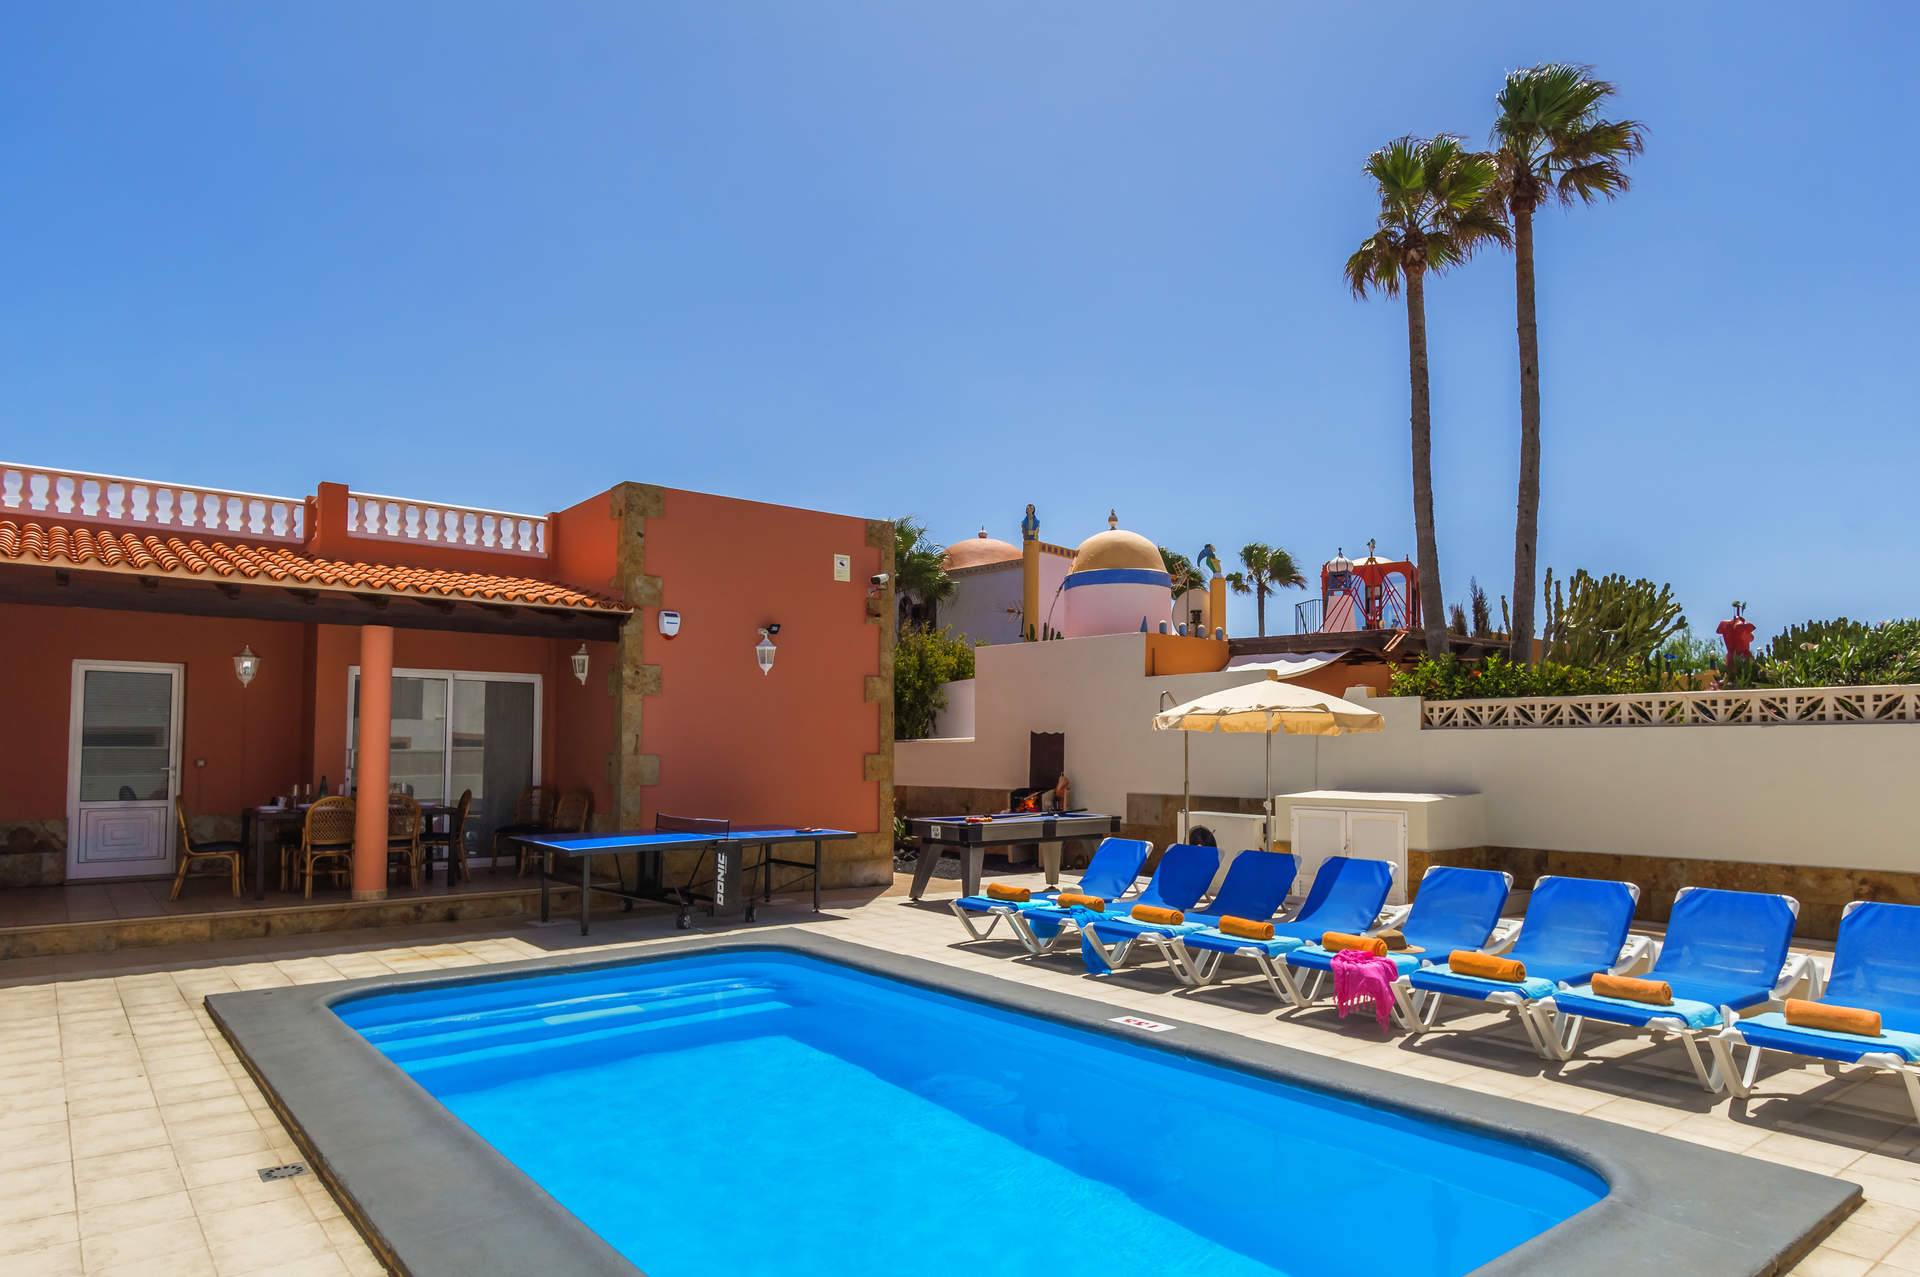 Villa Talkayan, Corralejo, Fuerteventura, Spain